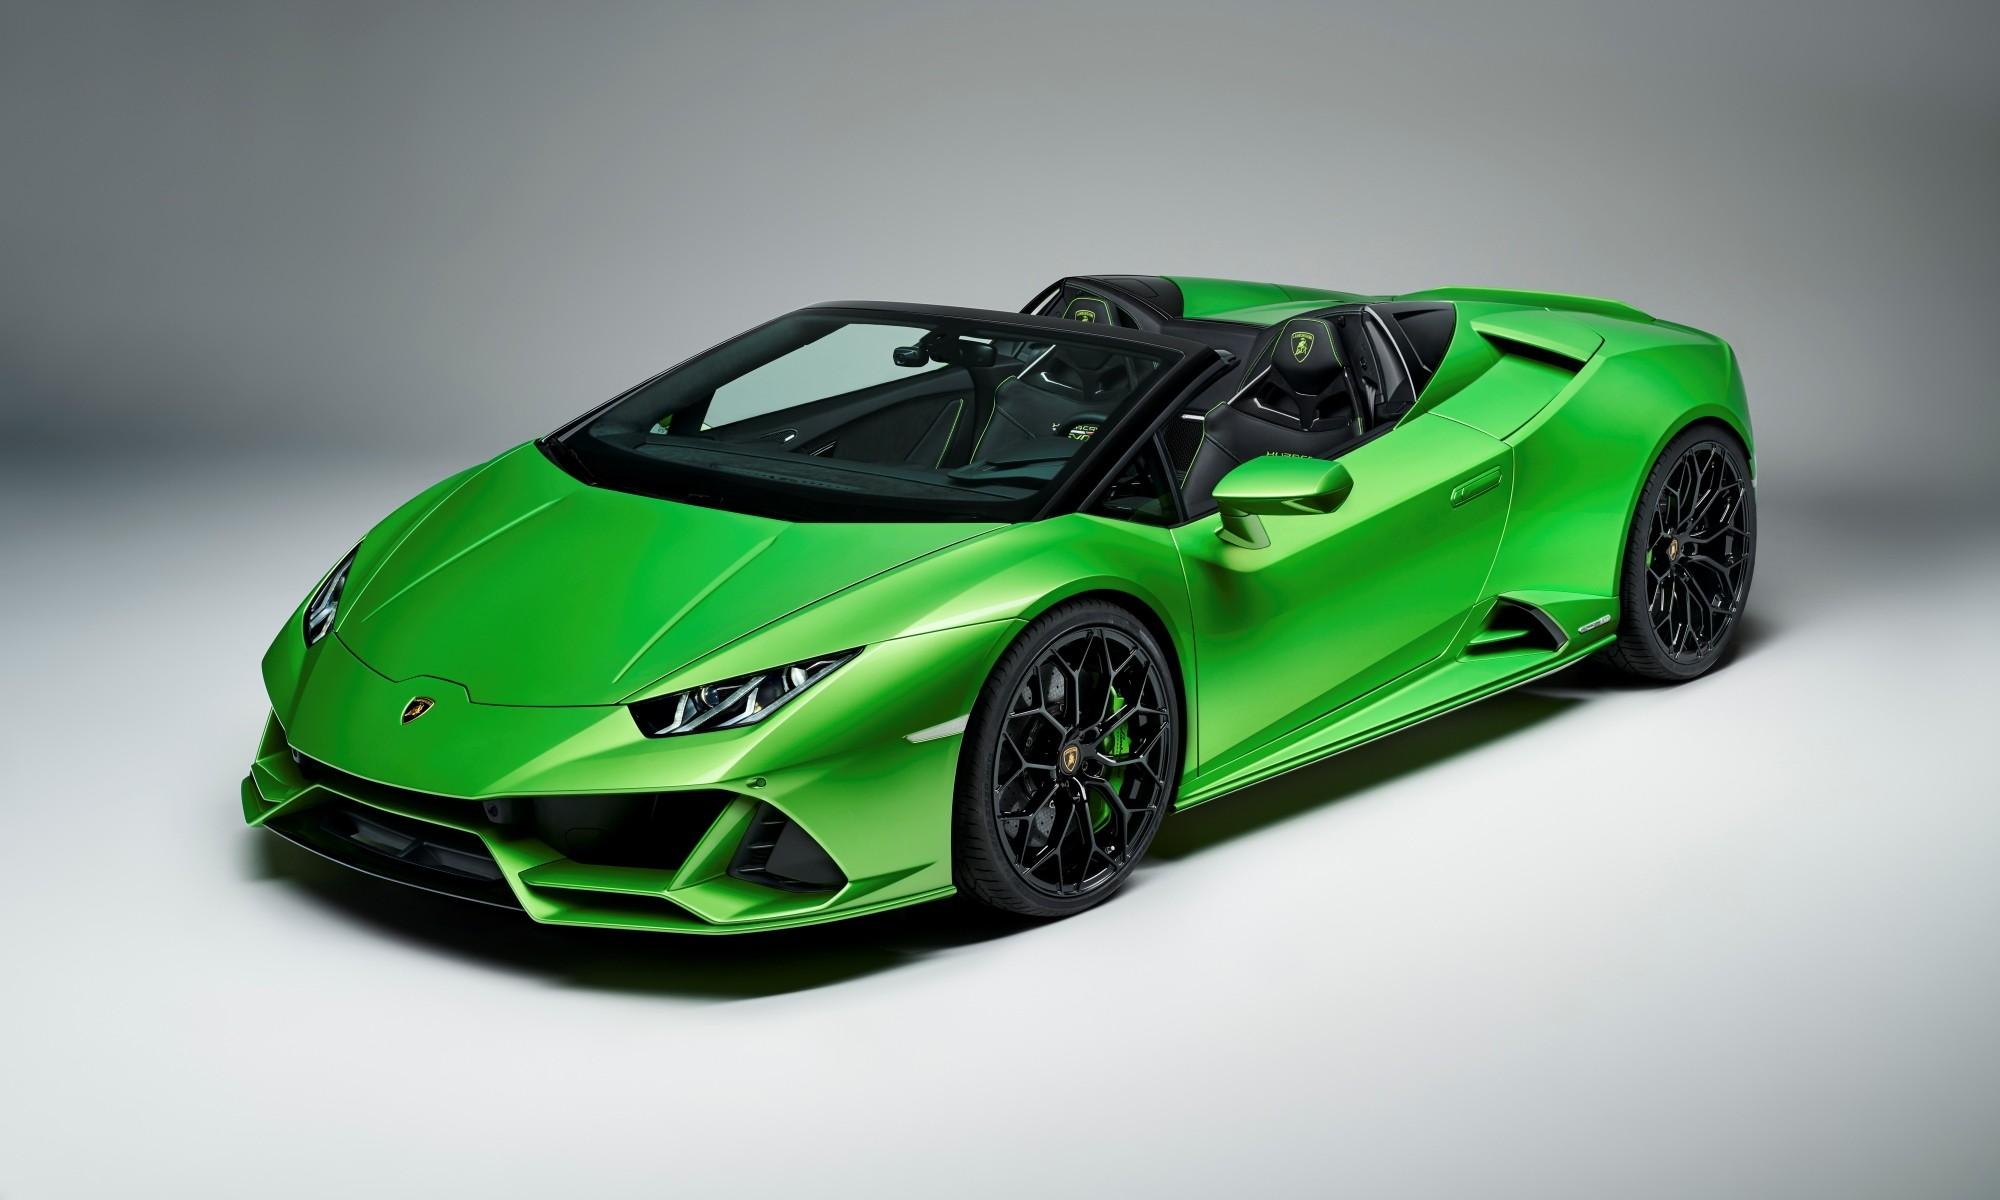 Lamborghini Huracan Evo Spyder front